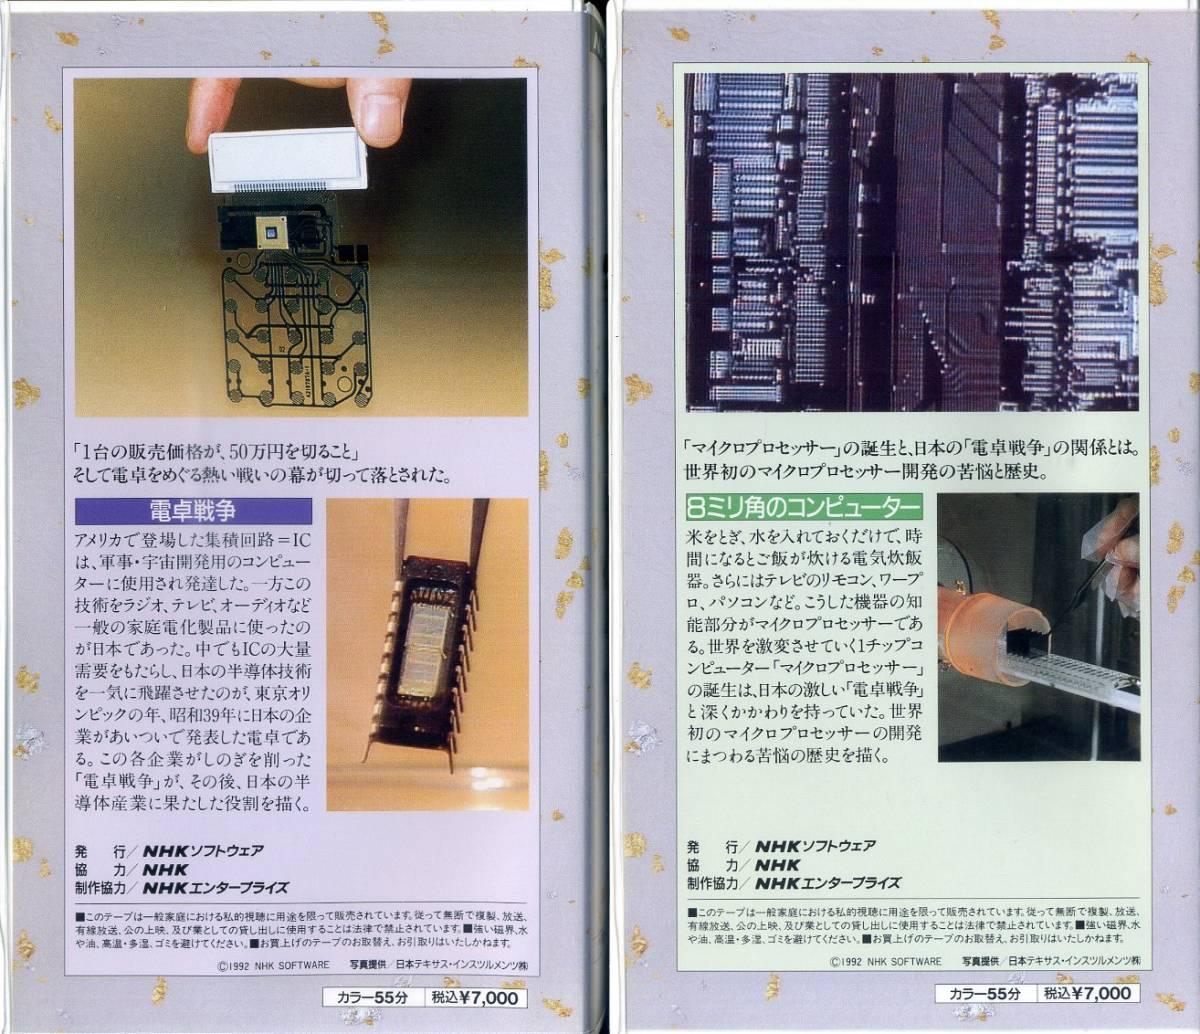 即決〈同梱歓迎〉VHS電子立国日本の自叙伝 全4巻(計4本揃) NHKビデオ◎その他多数出品中∞3167_画像6